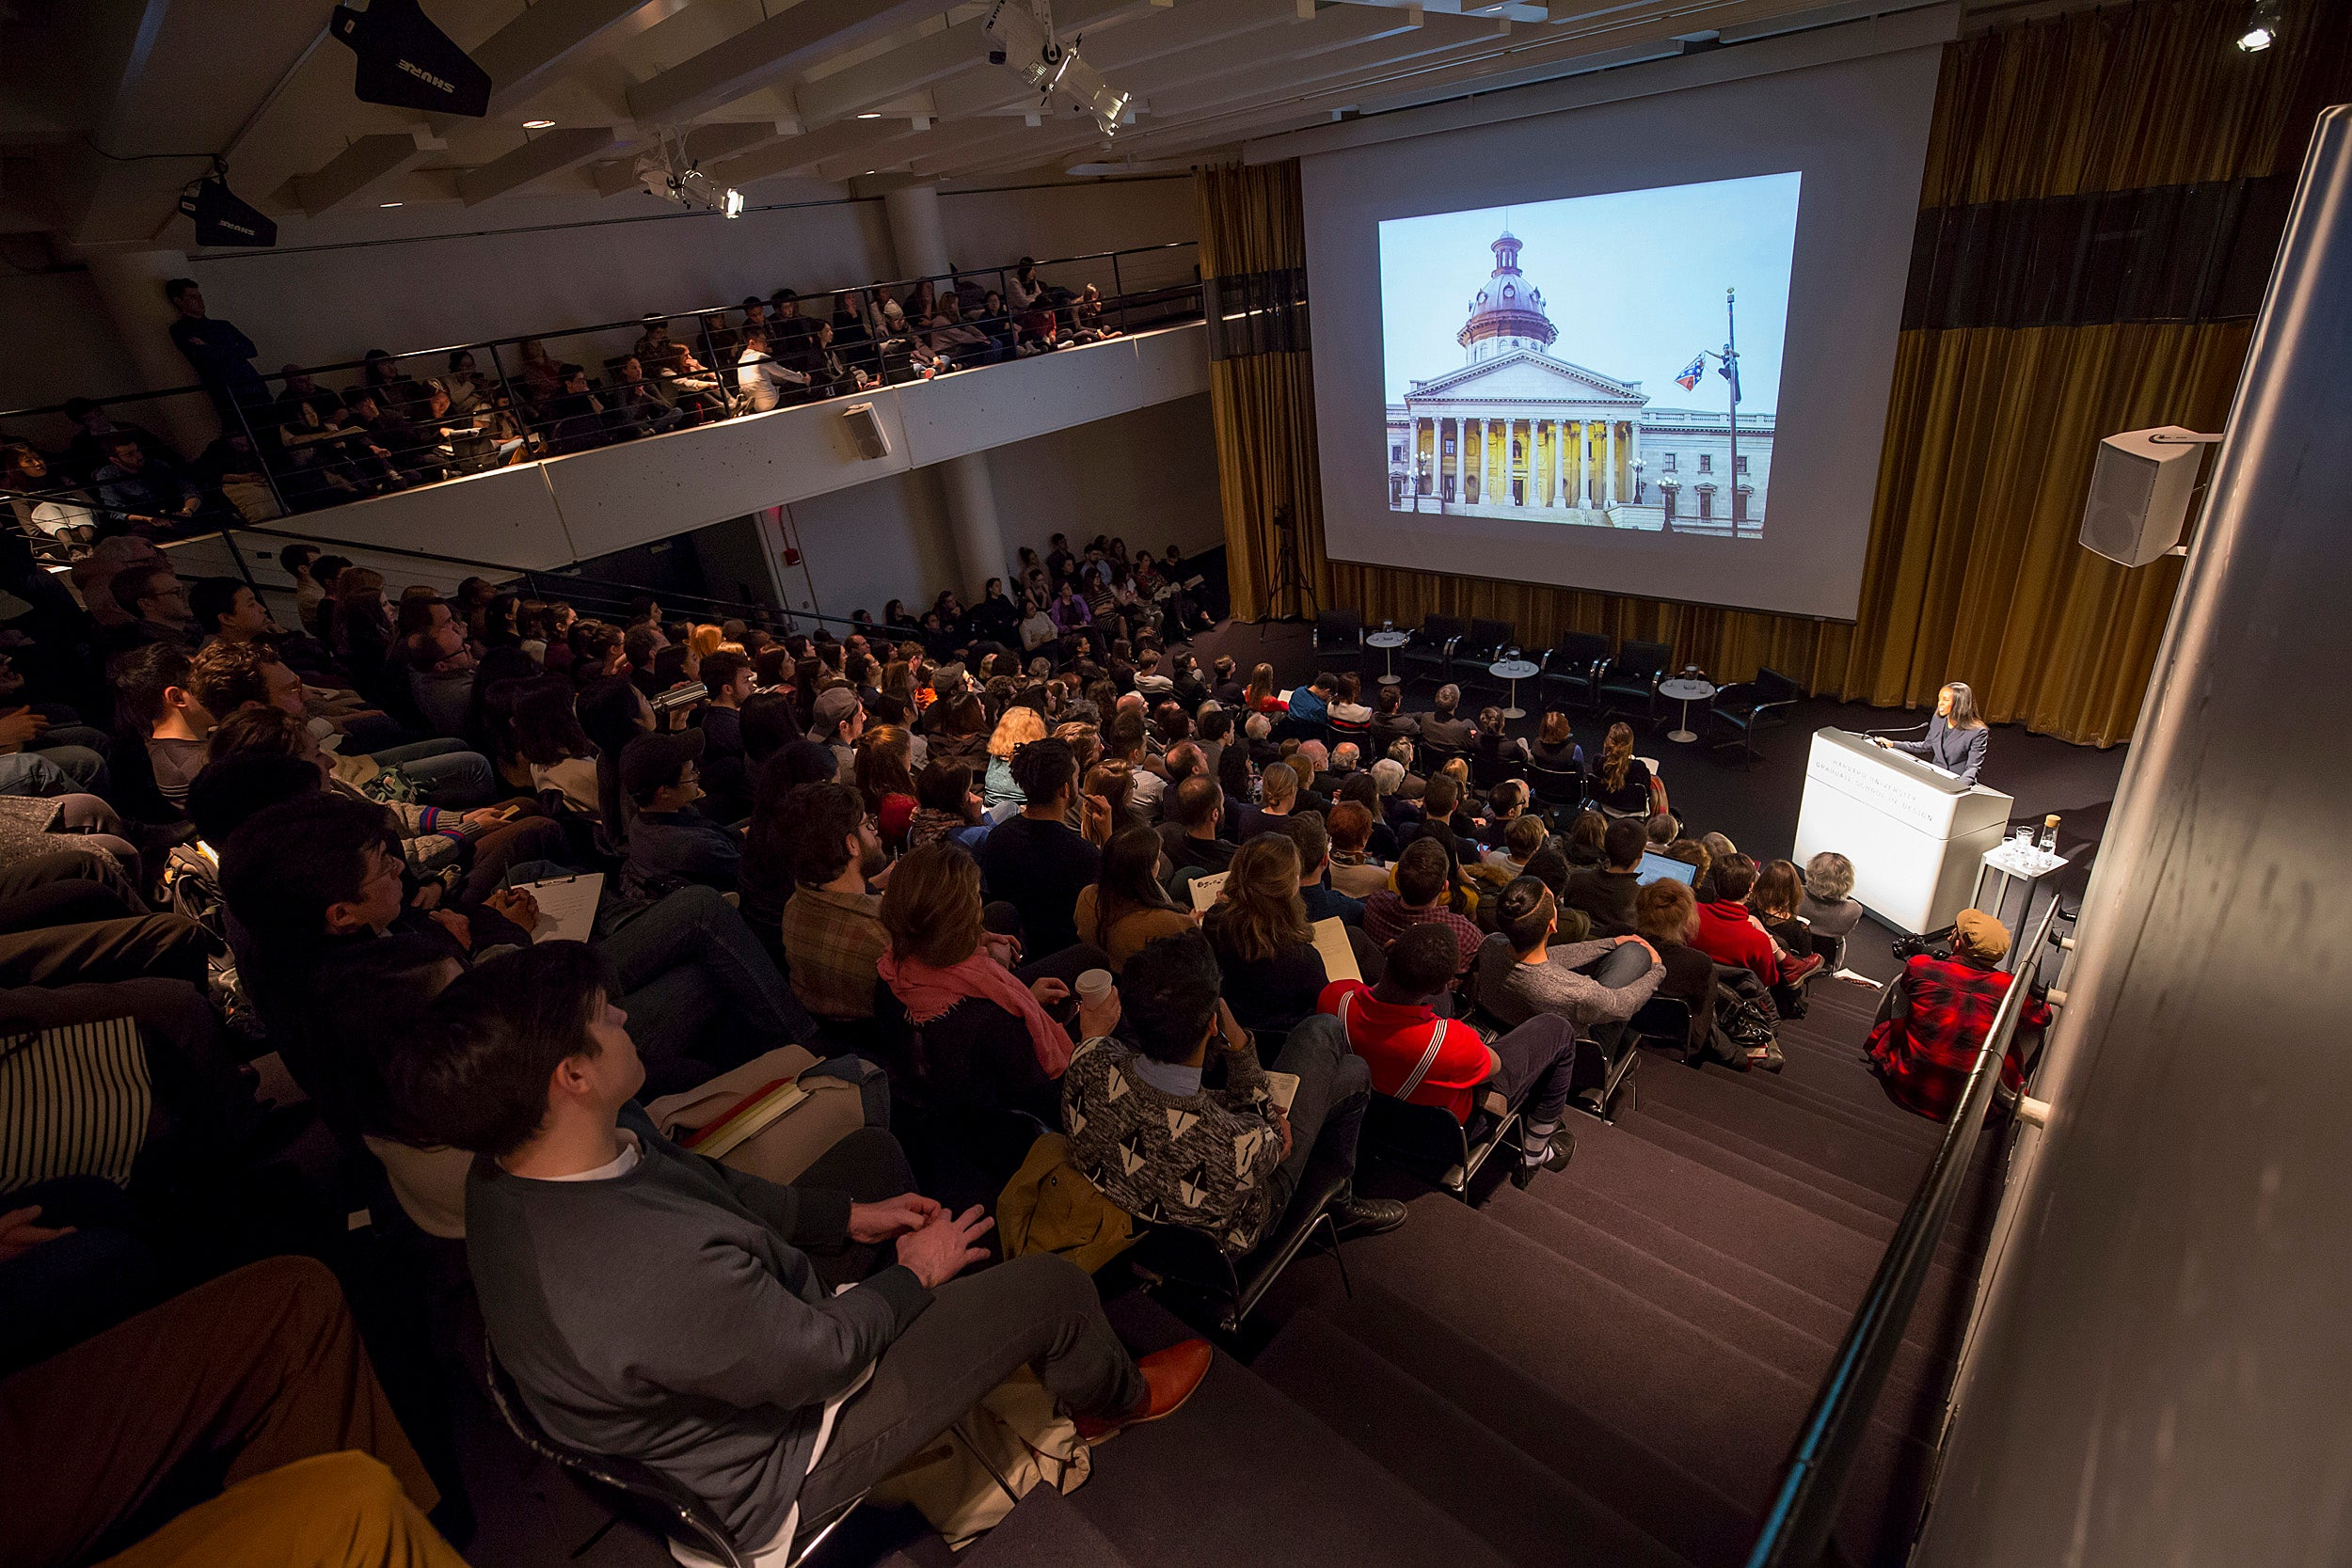 Panel discussion at Harvard University's Graduate School on monuments.